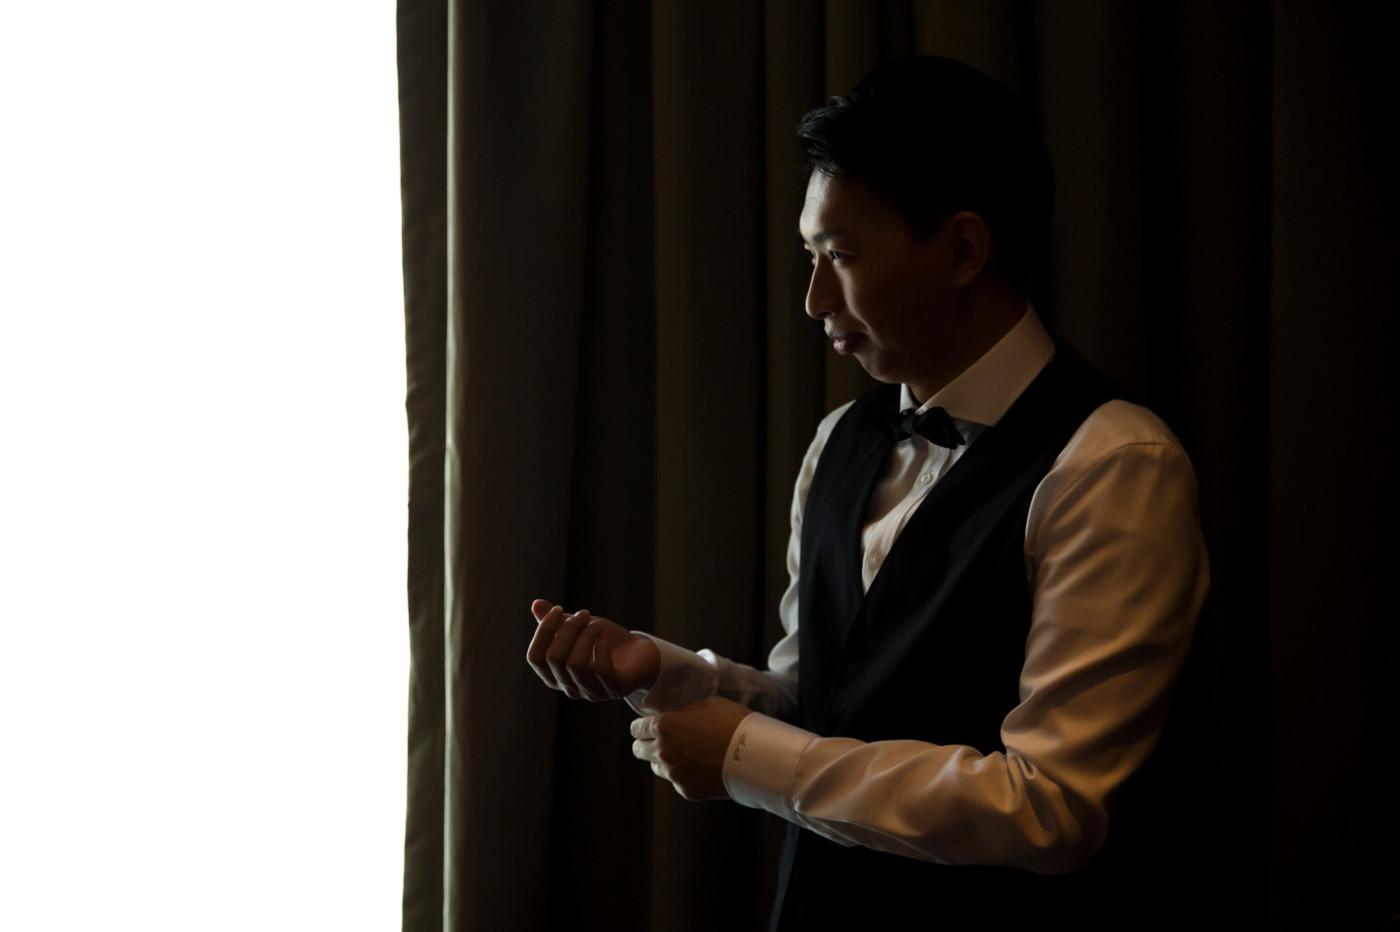 【KAI 婚礼纪实】Z&Y 常州婚礼5